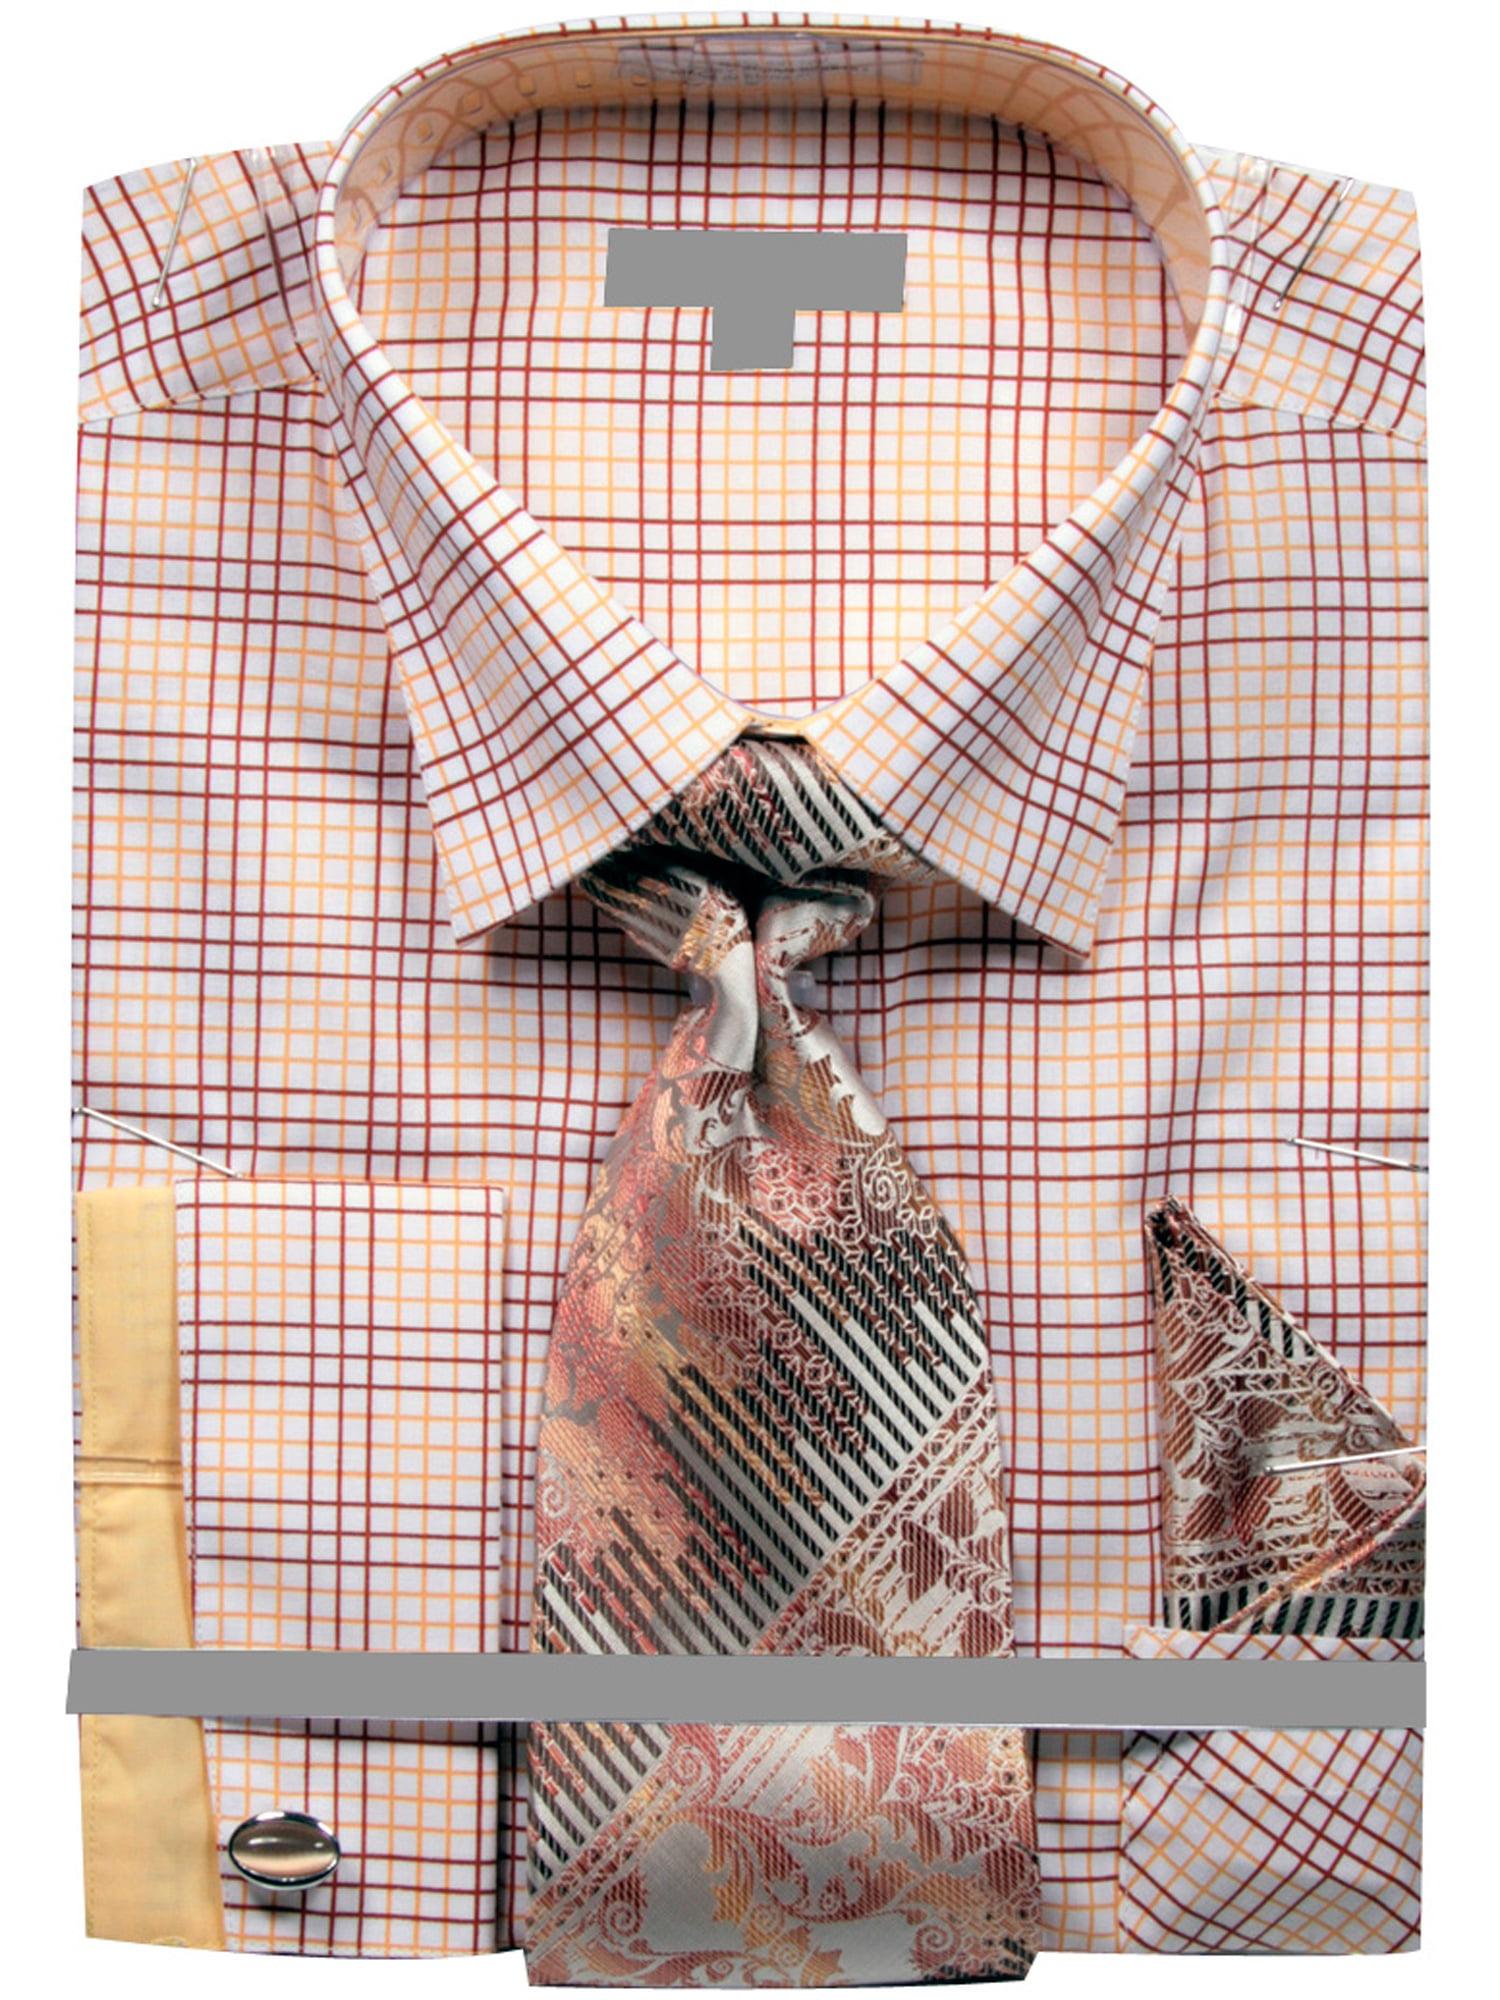 Men's Grid Checker Pattern French Cuff Shirt Tie Handkerchief Cuff Links